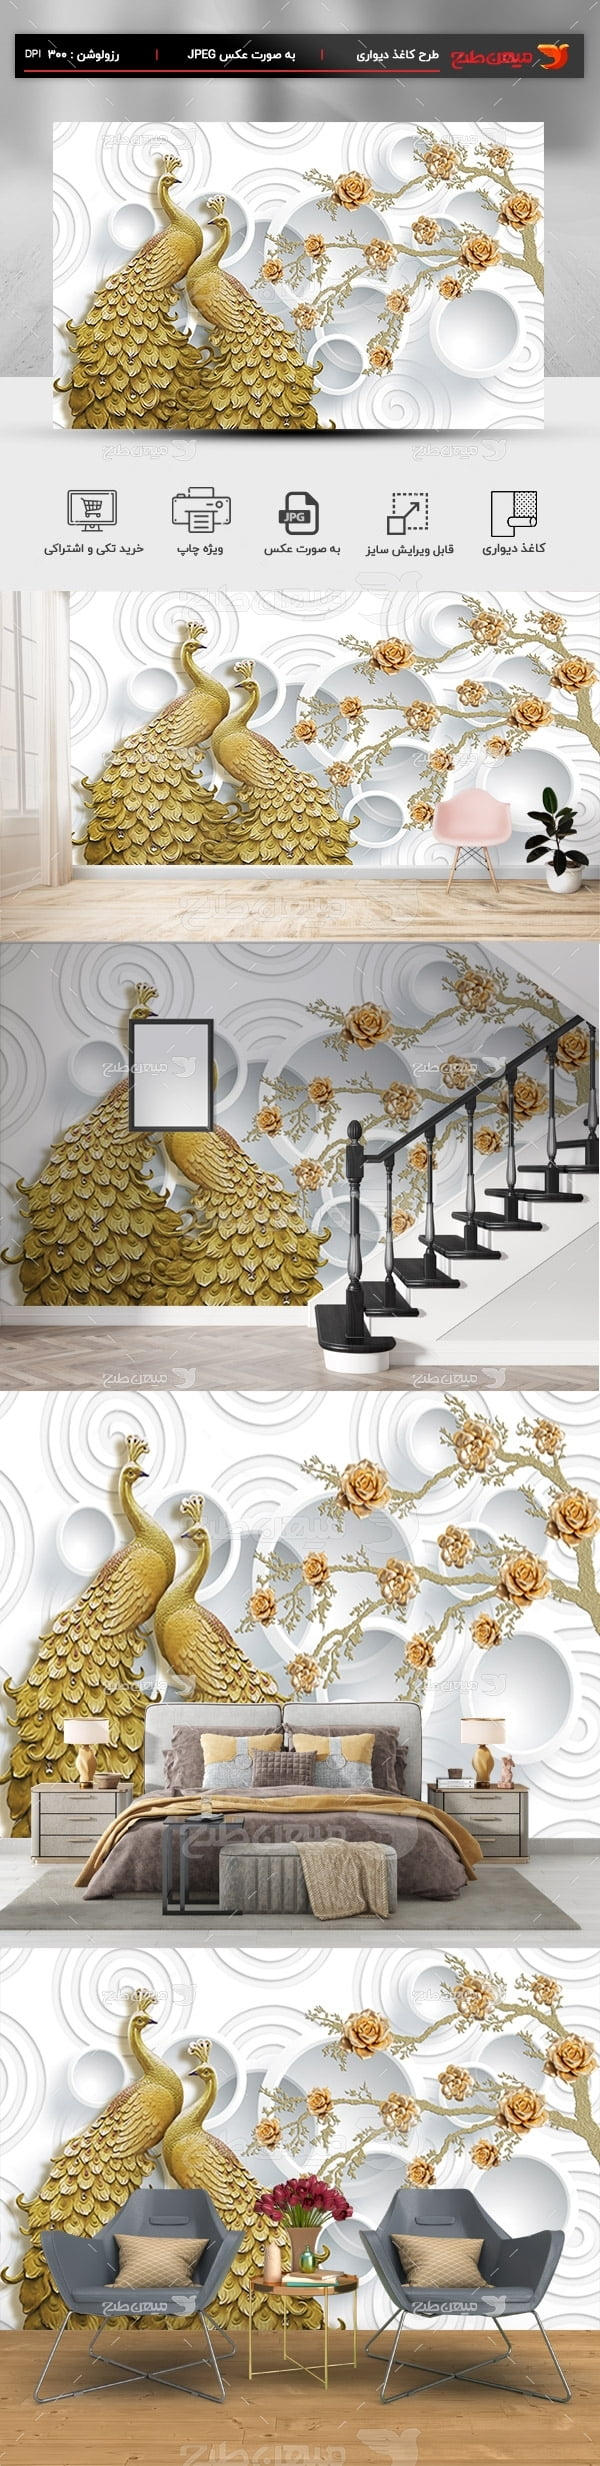 پوستر کاغذ دیواری سه بعدی گل و طاووس طلایی